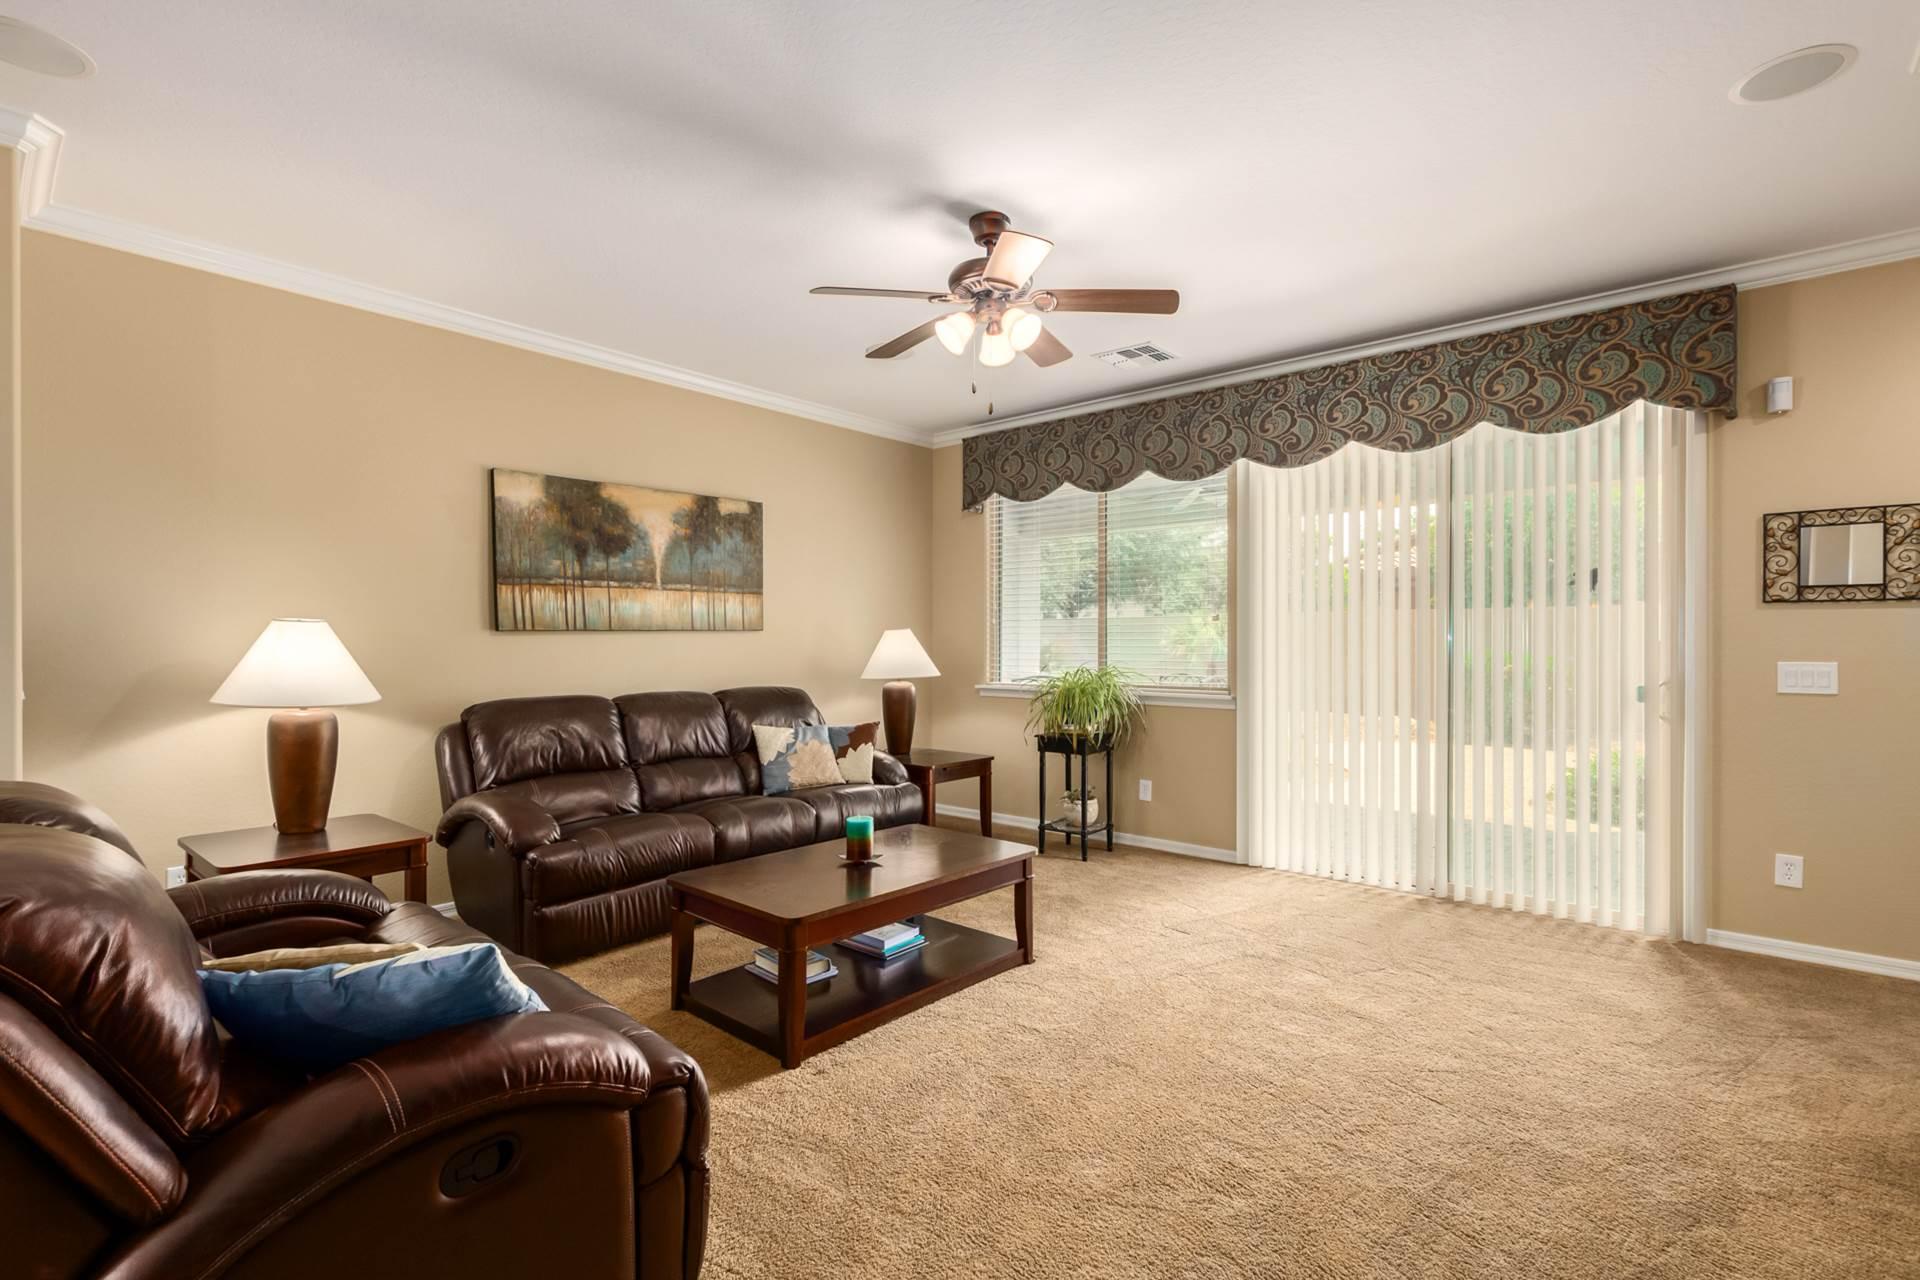 421 W Leatherwood Ave, Queen Creek, AZ 85140